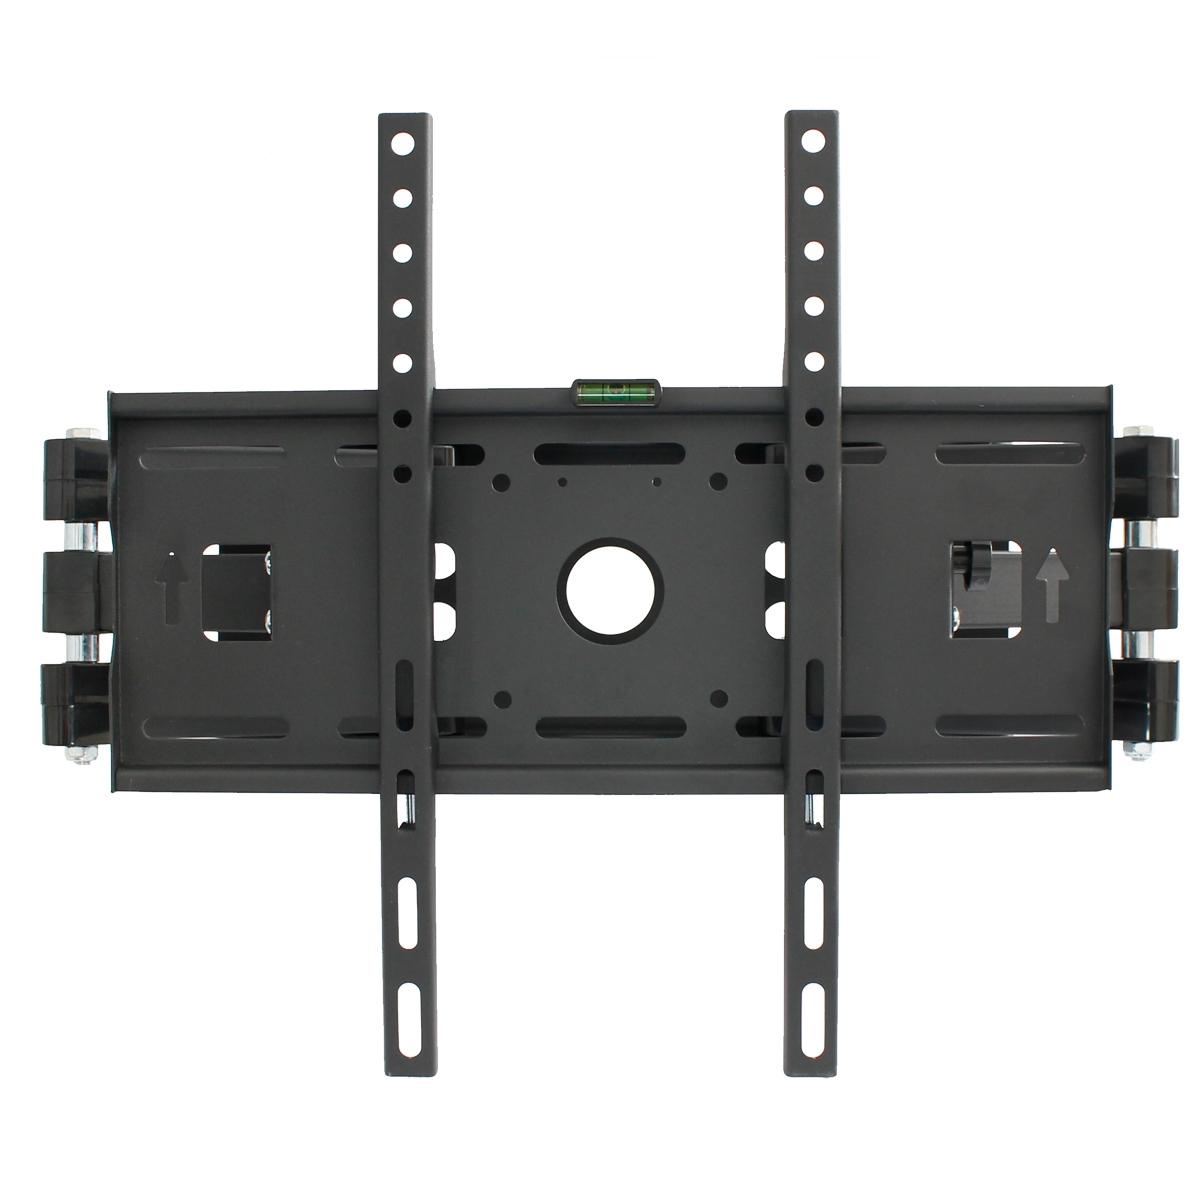 support rotatif tv lcd plasma mural boureau en acier dimensions varies a choisir ebay. Black Bedroom Furniture Sets. Home Design Ideas